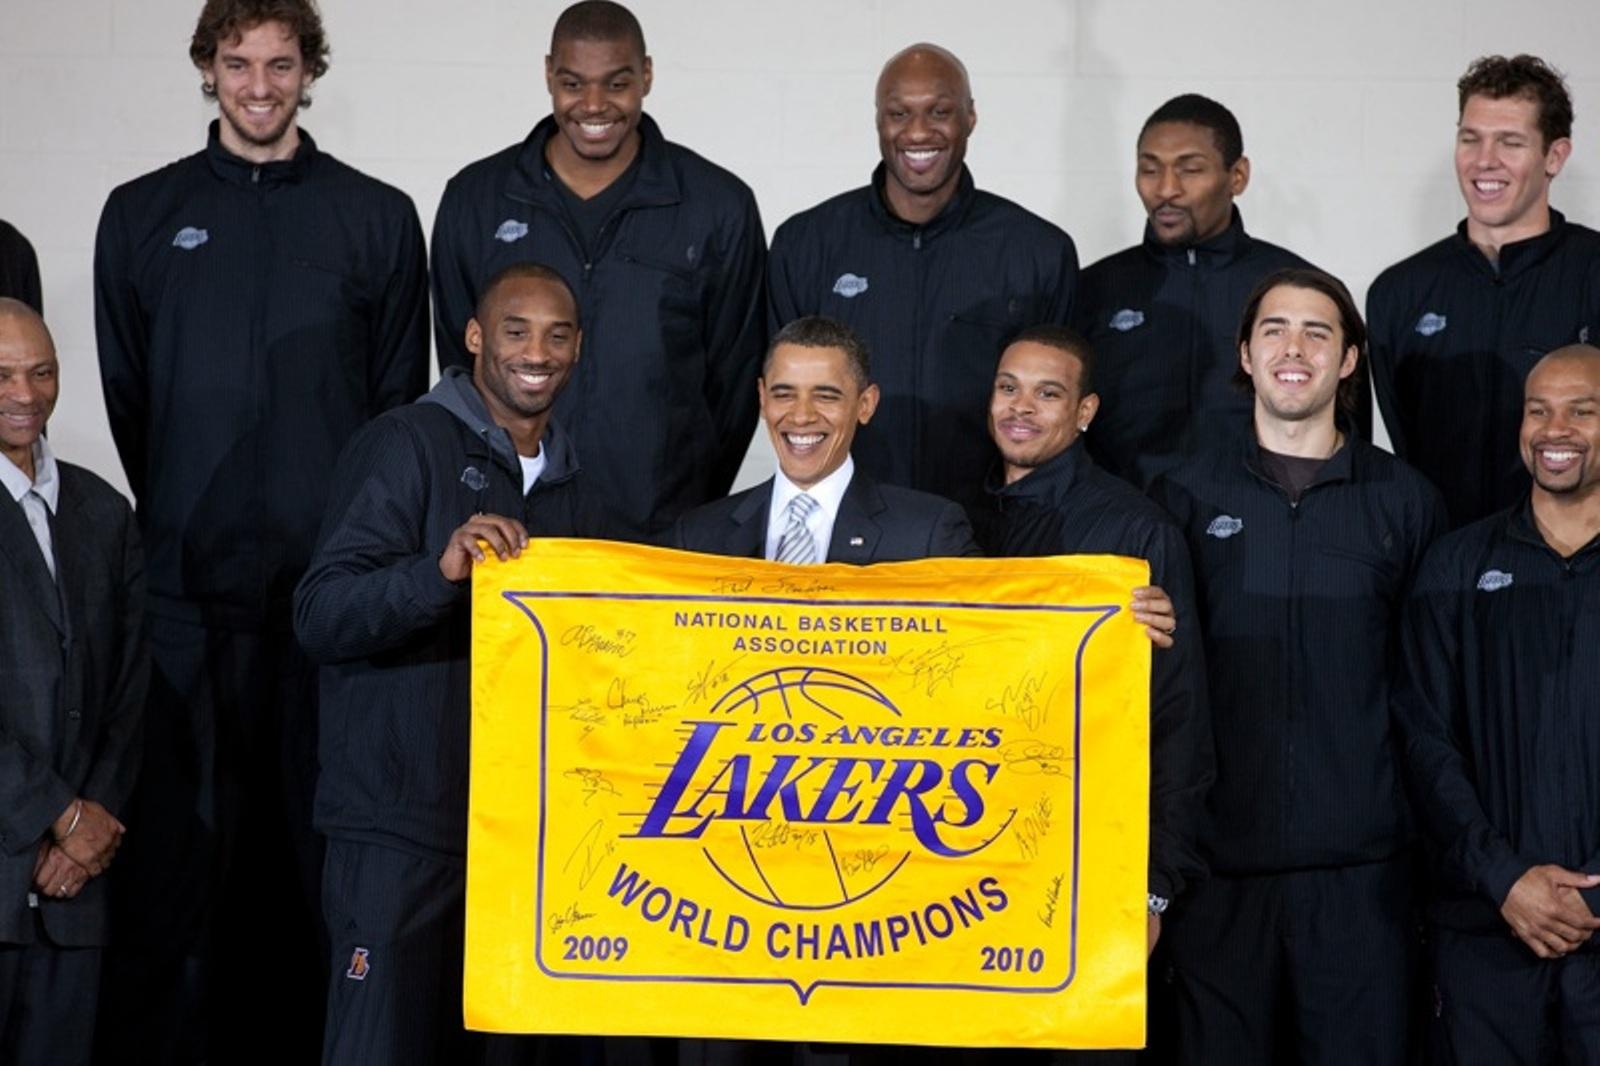 2010 NBA champion LA Lakers with President Barack Obama